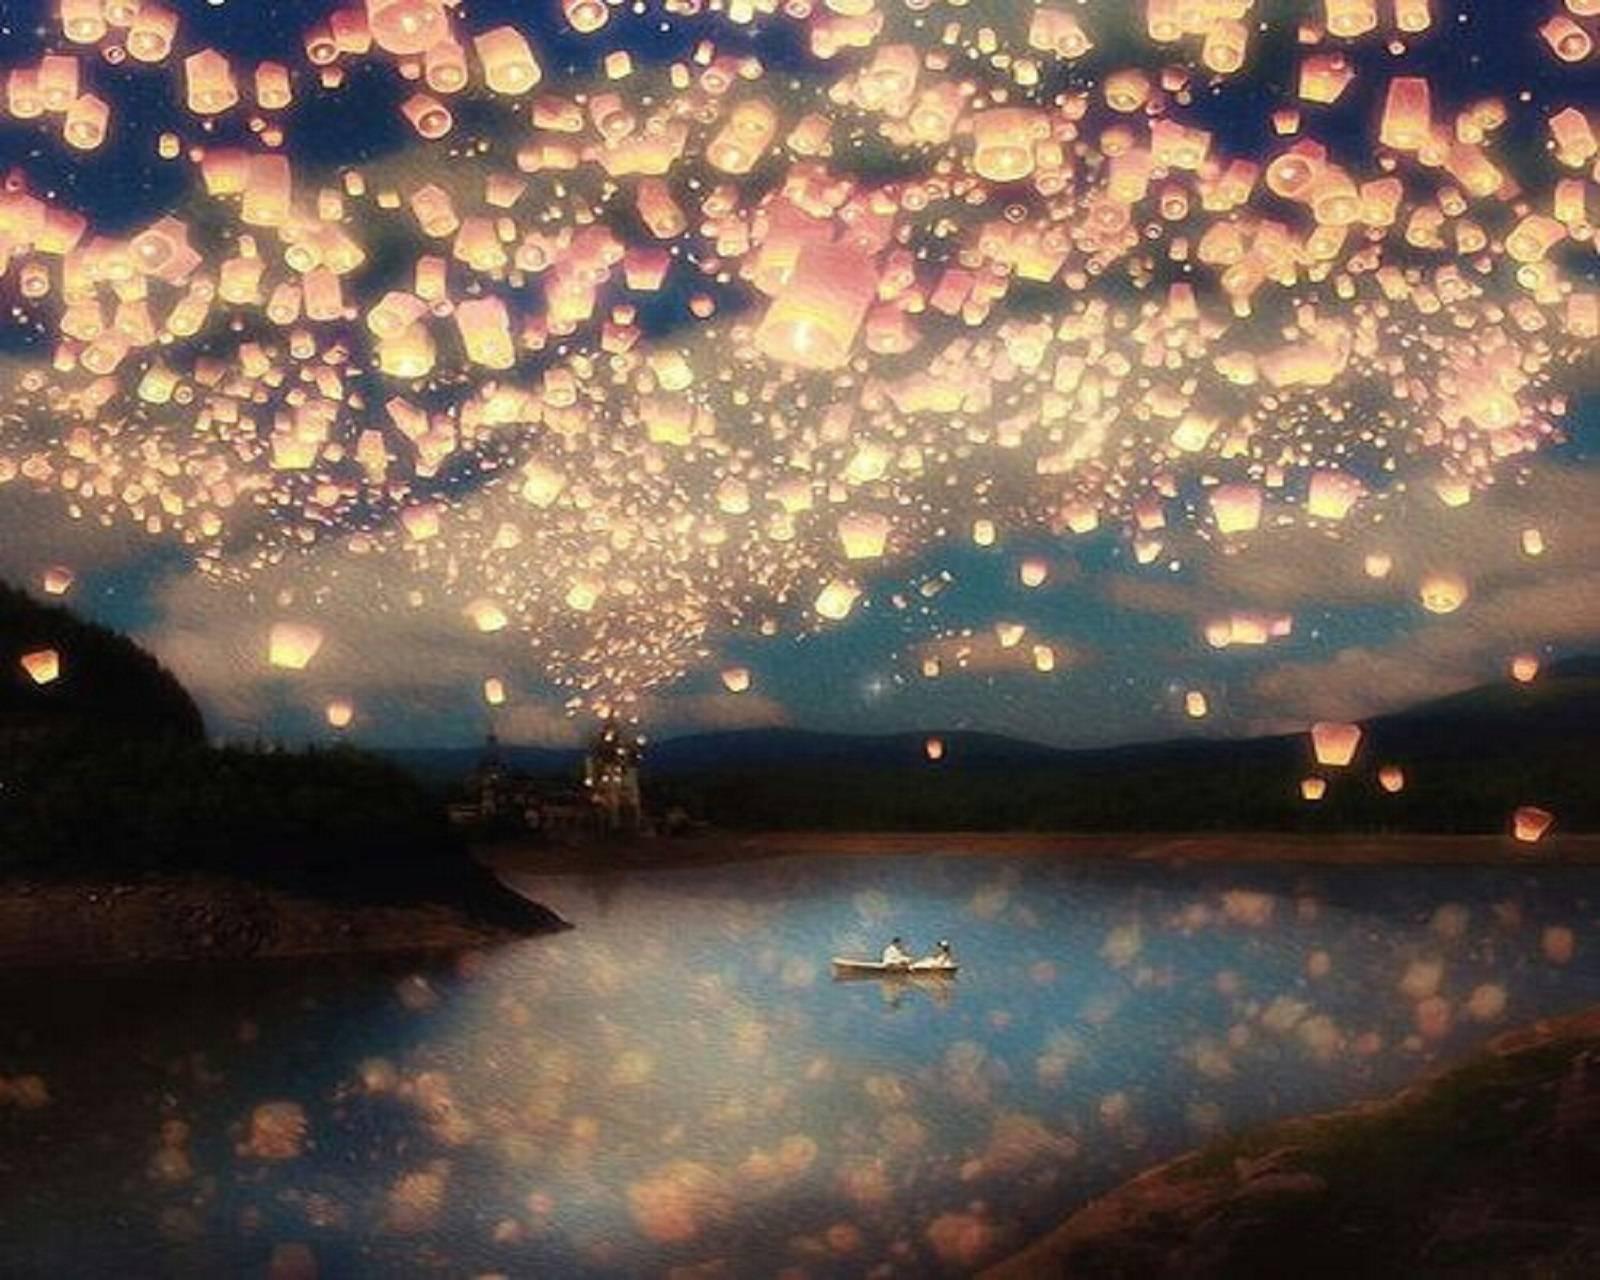 Disney Lake Lights